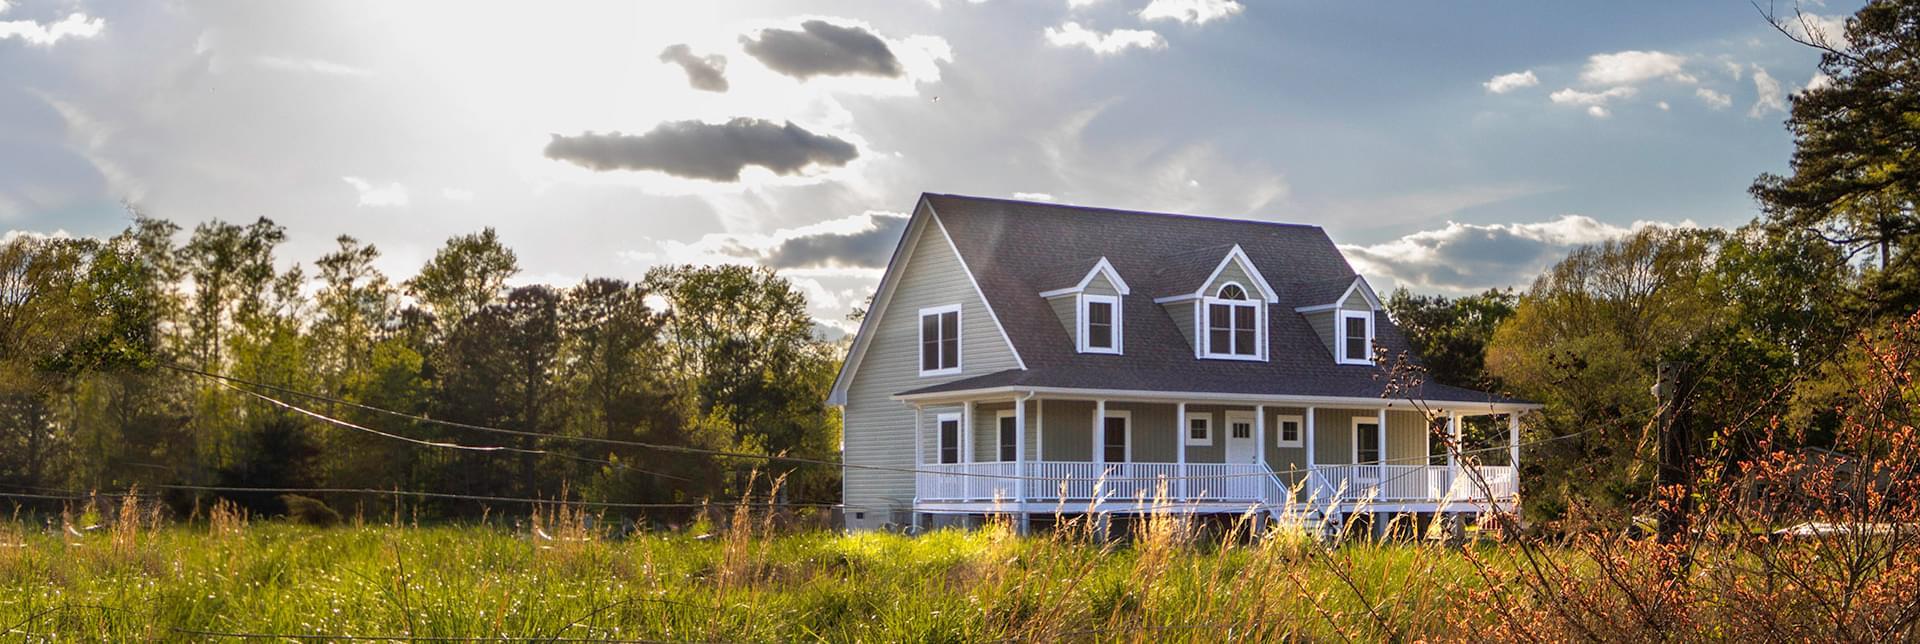 New Homes in Northumberland County VA